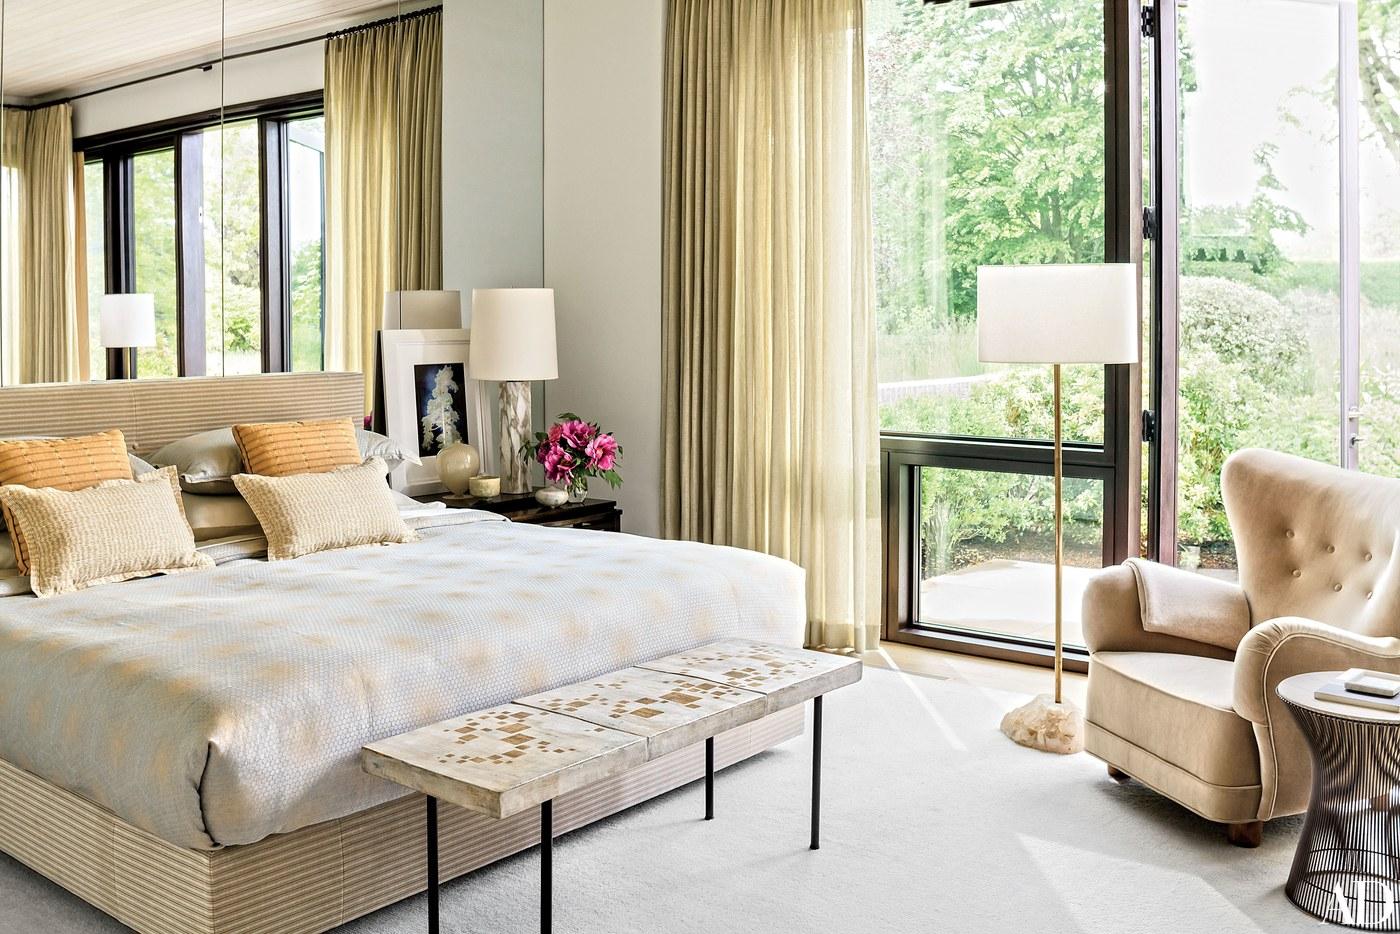 The-Classic-American-Decorating-by-AD100-List-Thomas-Obrien-Aero-Studios-elegant-bedroom